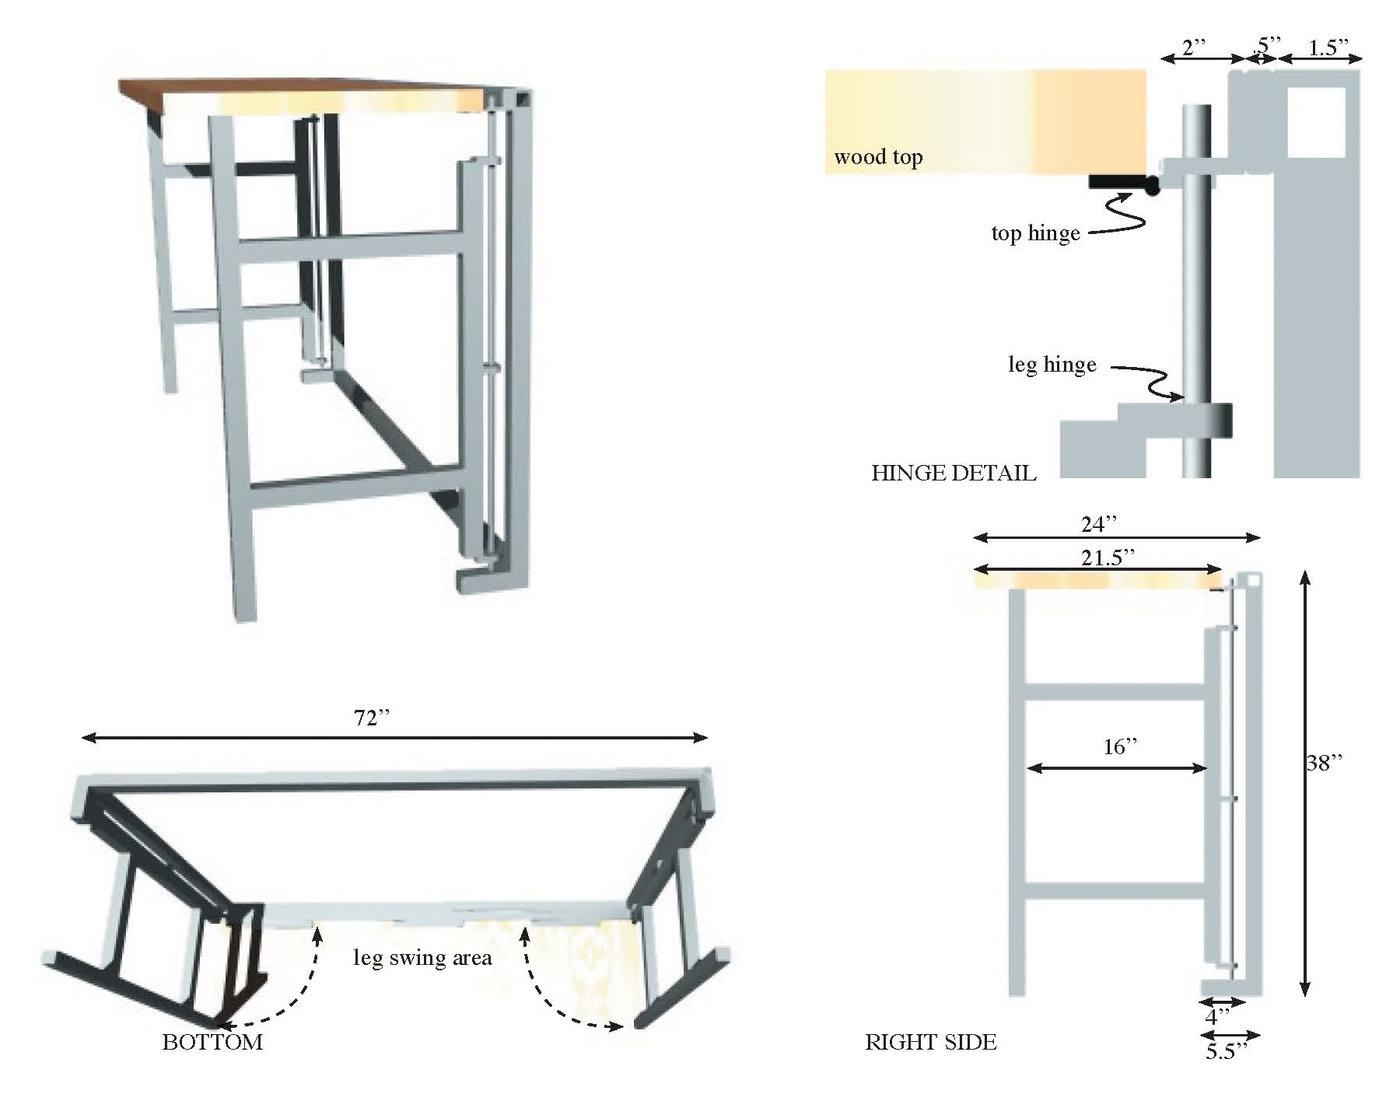 Phenomenal Dj Table By Derek Spence At Coroflot Com Interior Design Ideas Clesiryabchikinfo